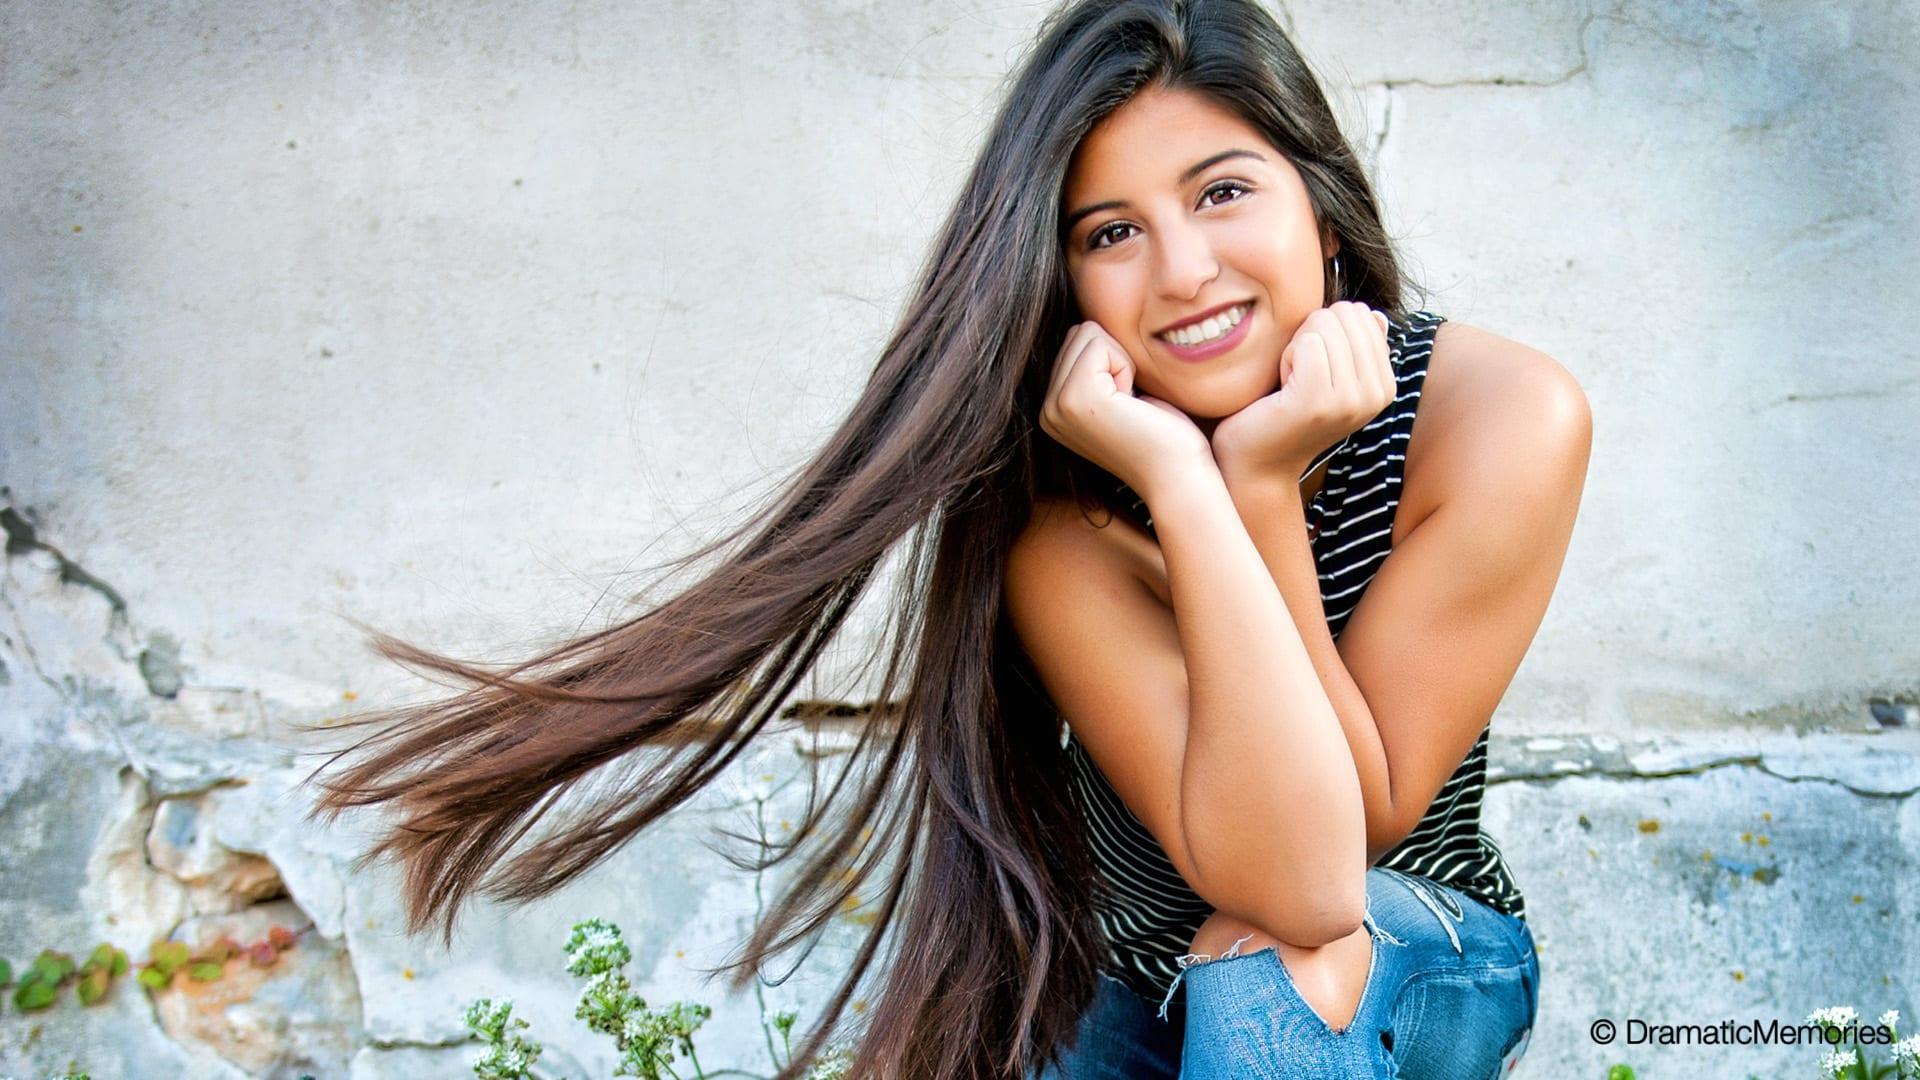 latino senior girl sitting outside near an old wall